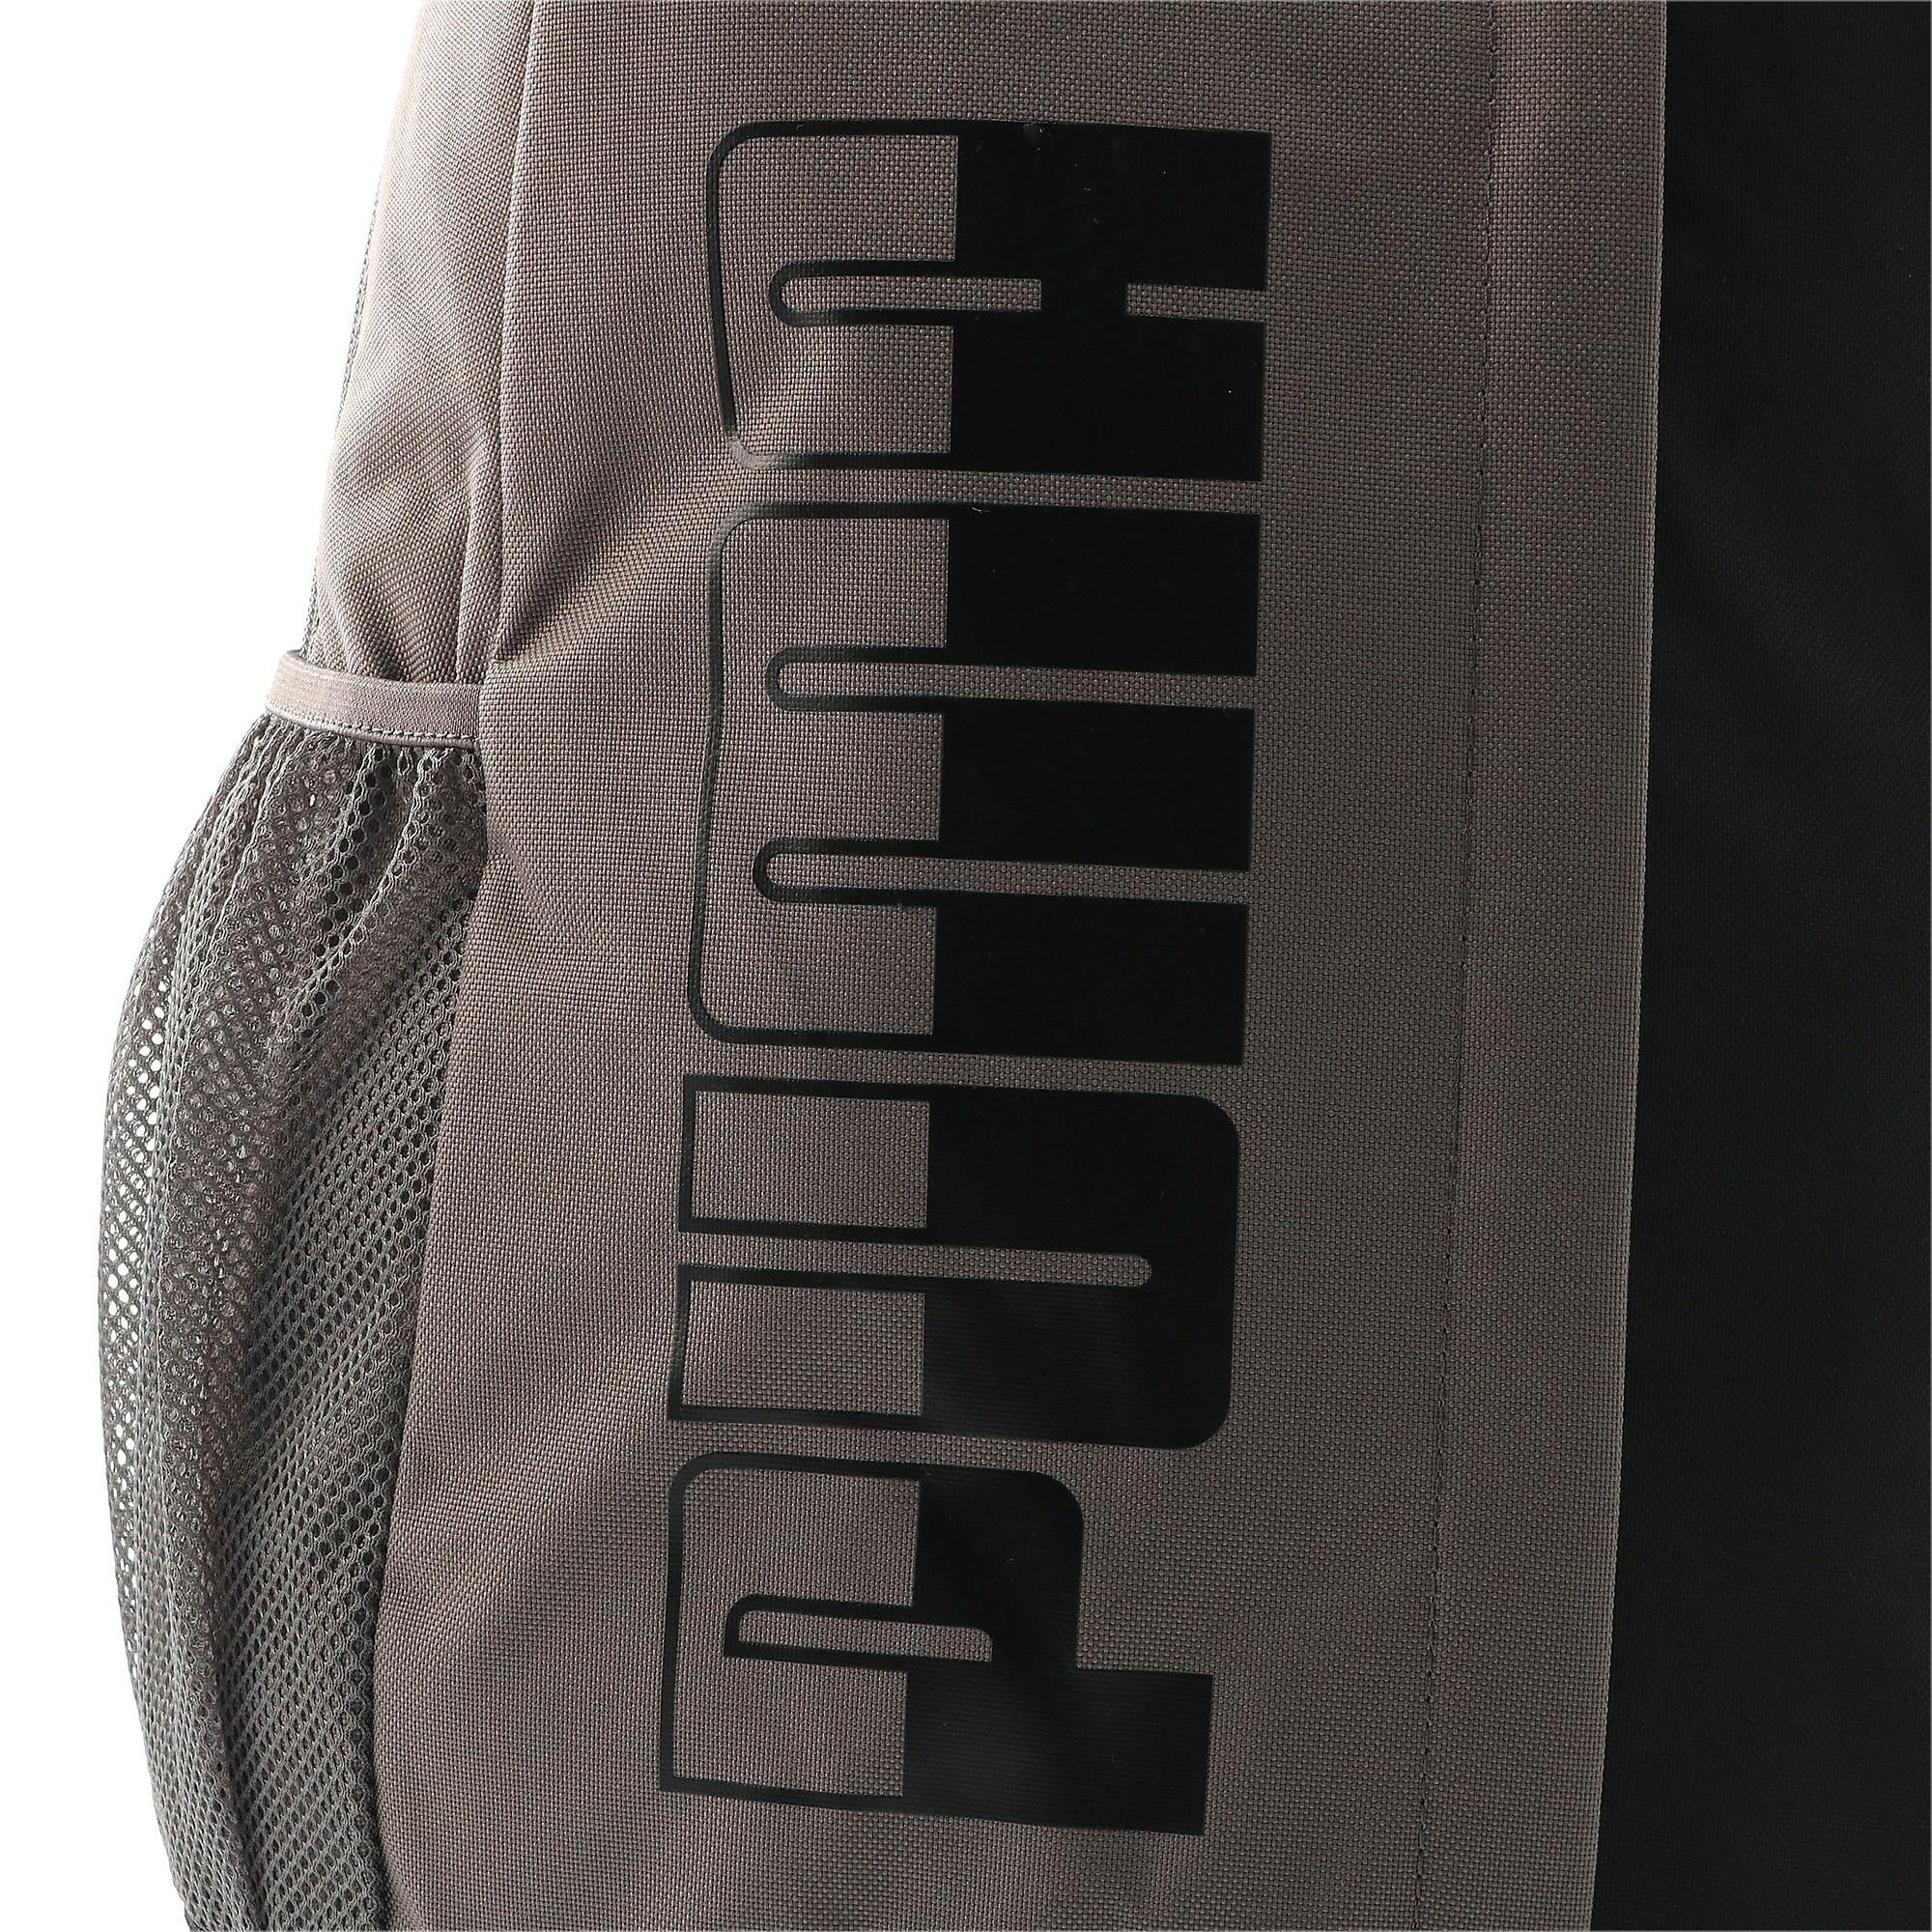 Thumbnail 5 of プーマ プラス バックパック II, Charcoal Gray-Puma Black, medium-JPN